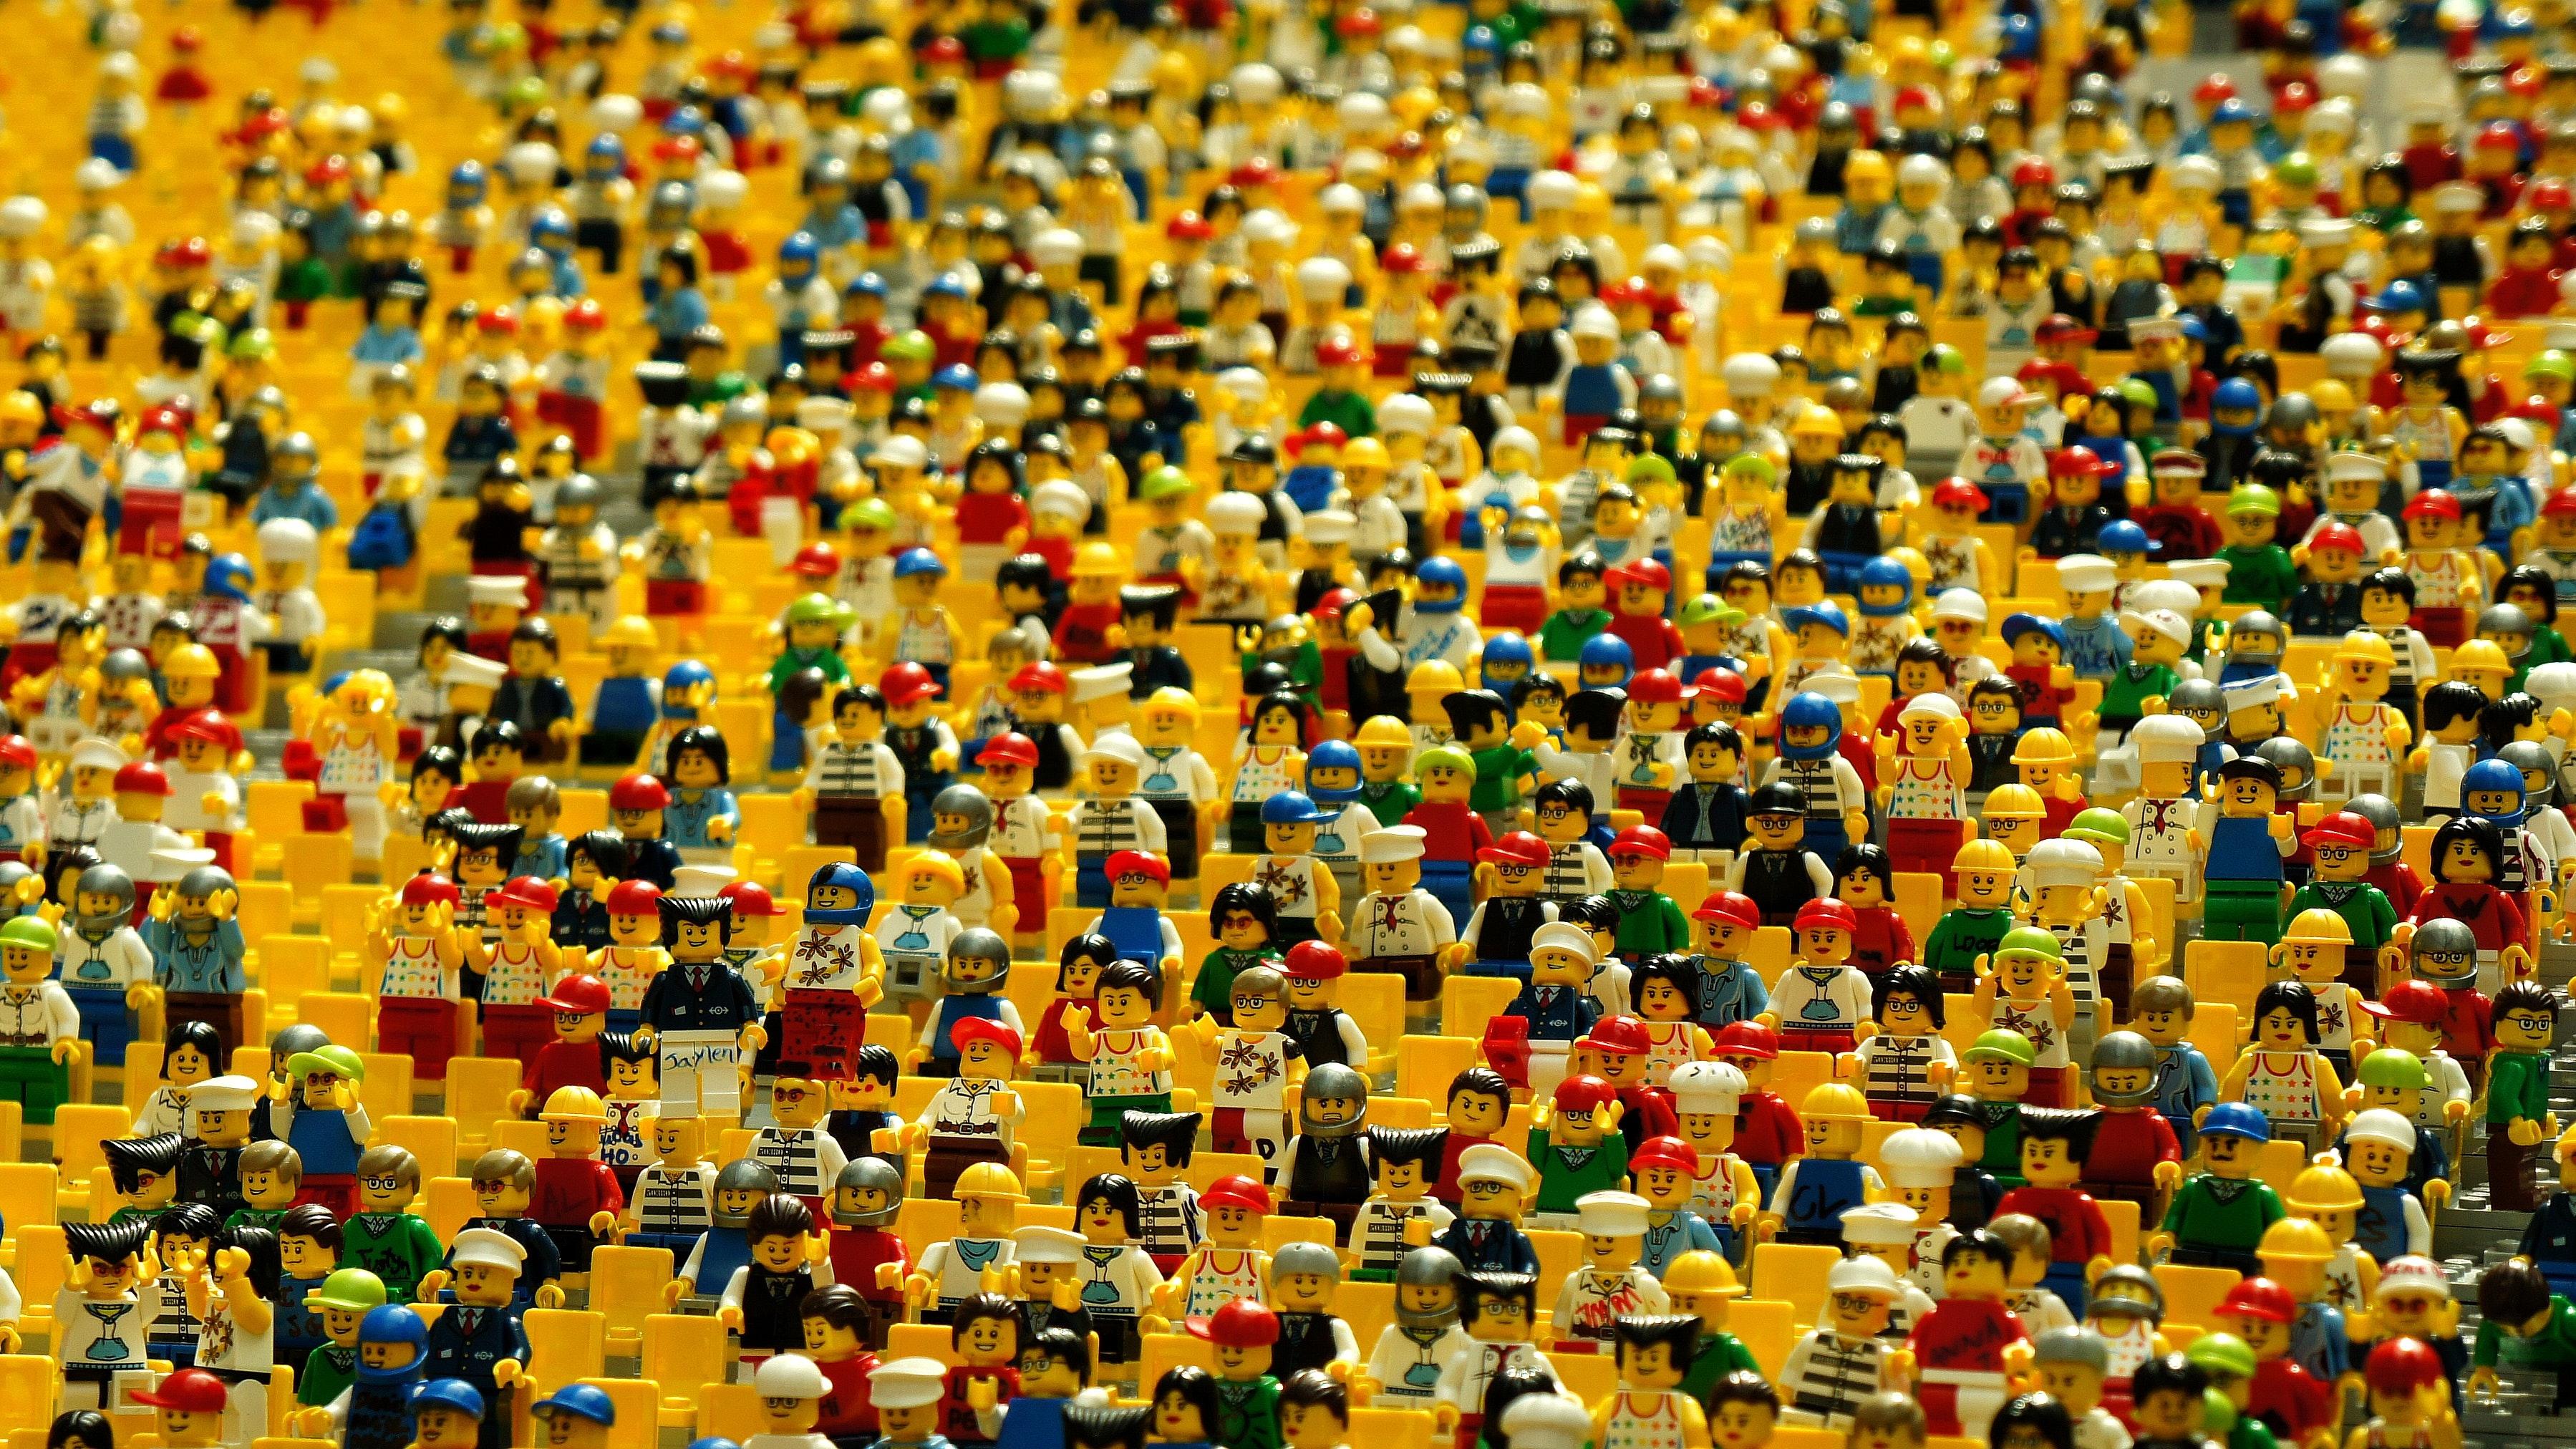 Sea of unidentified lego people